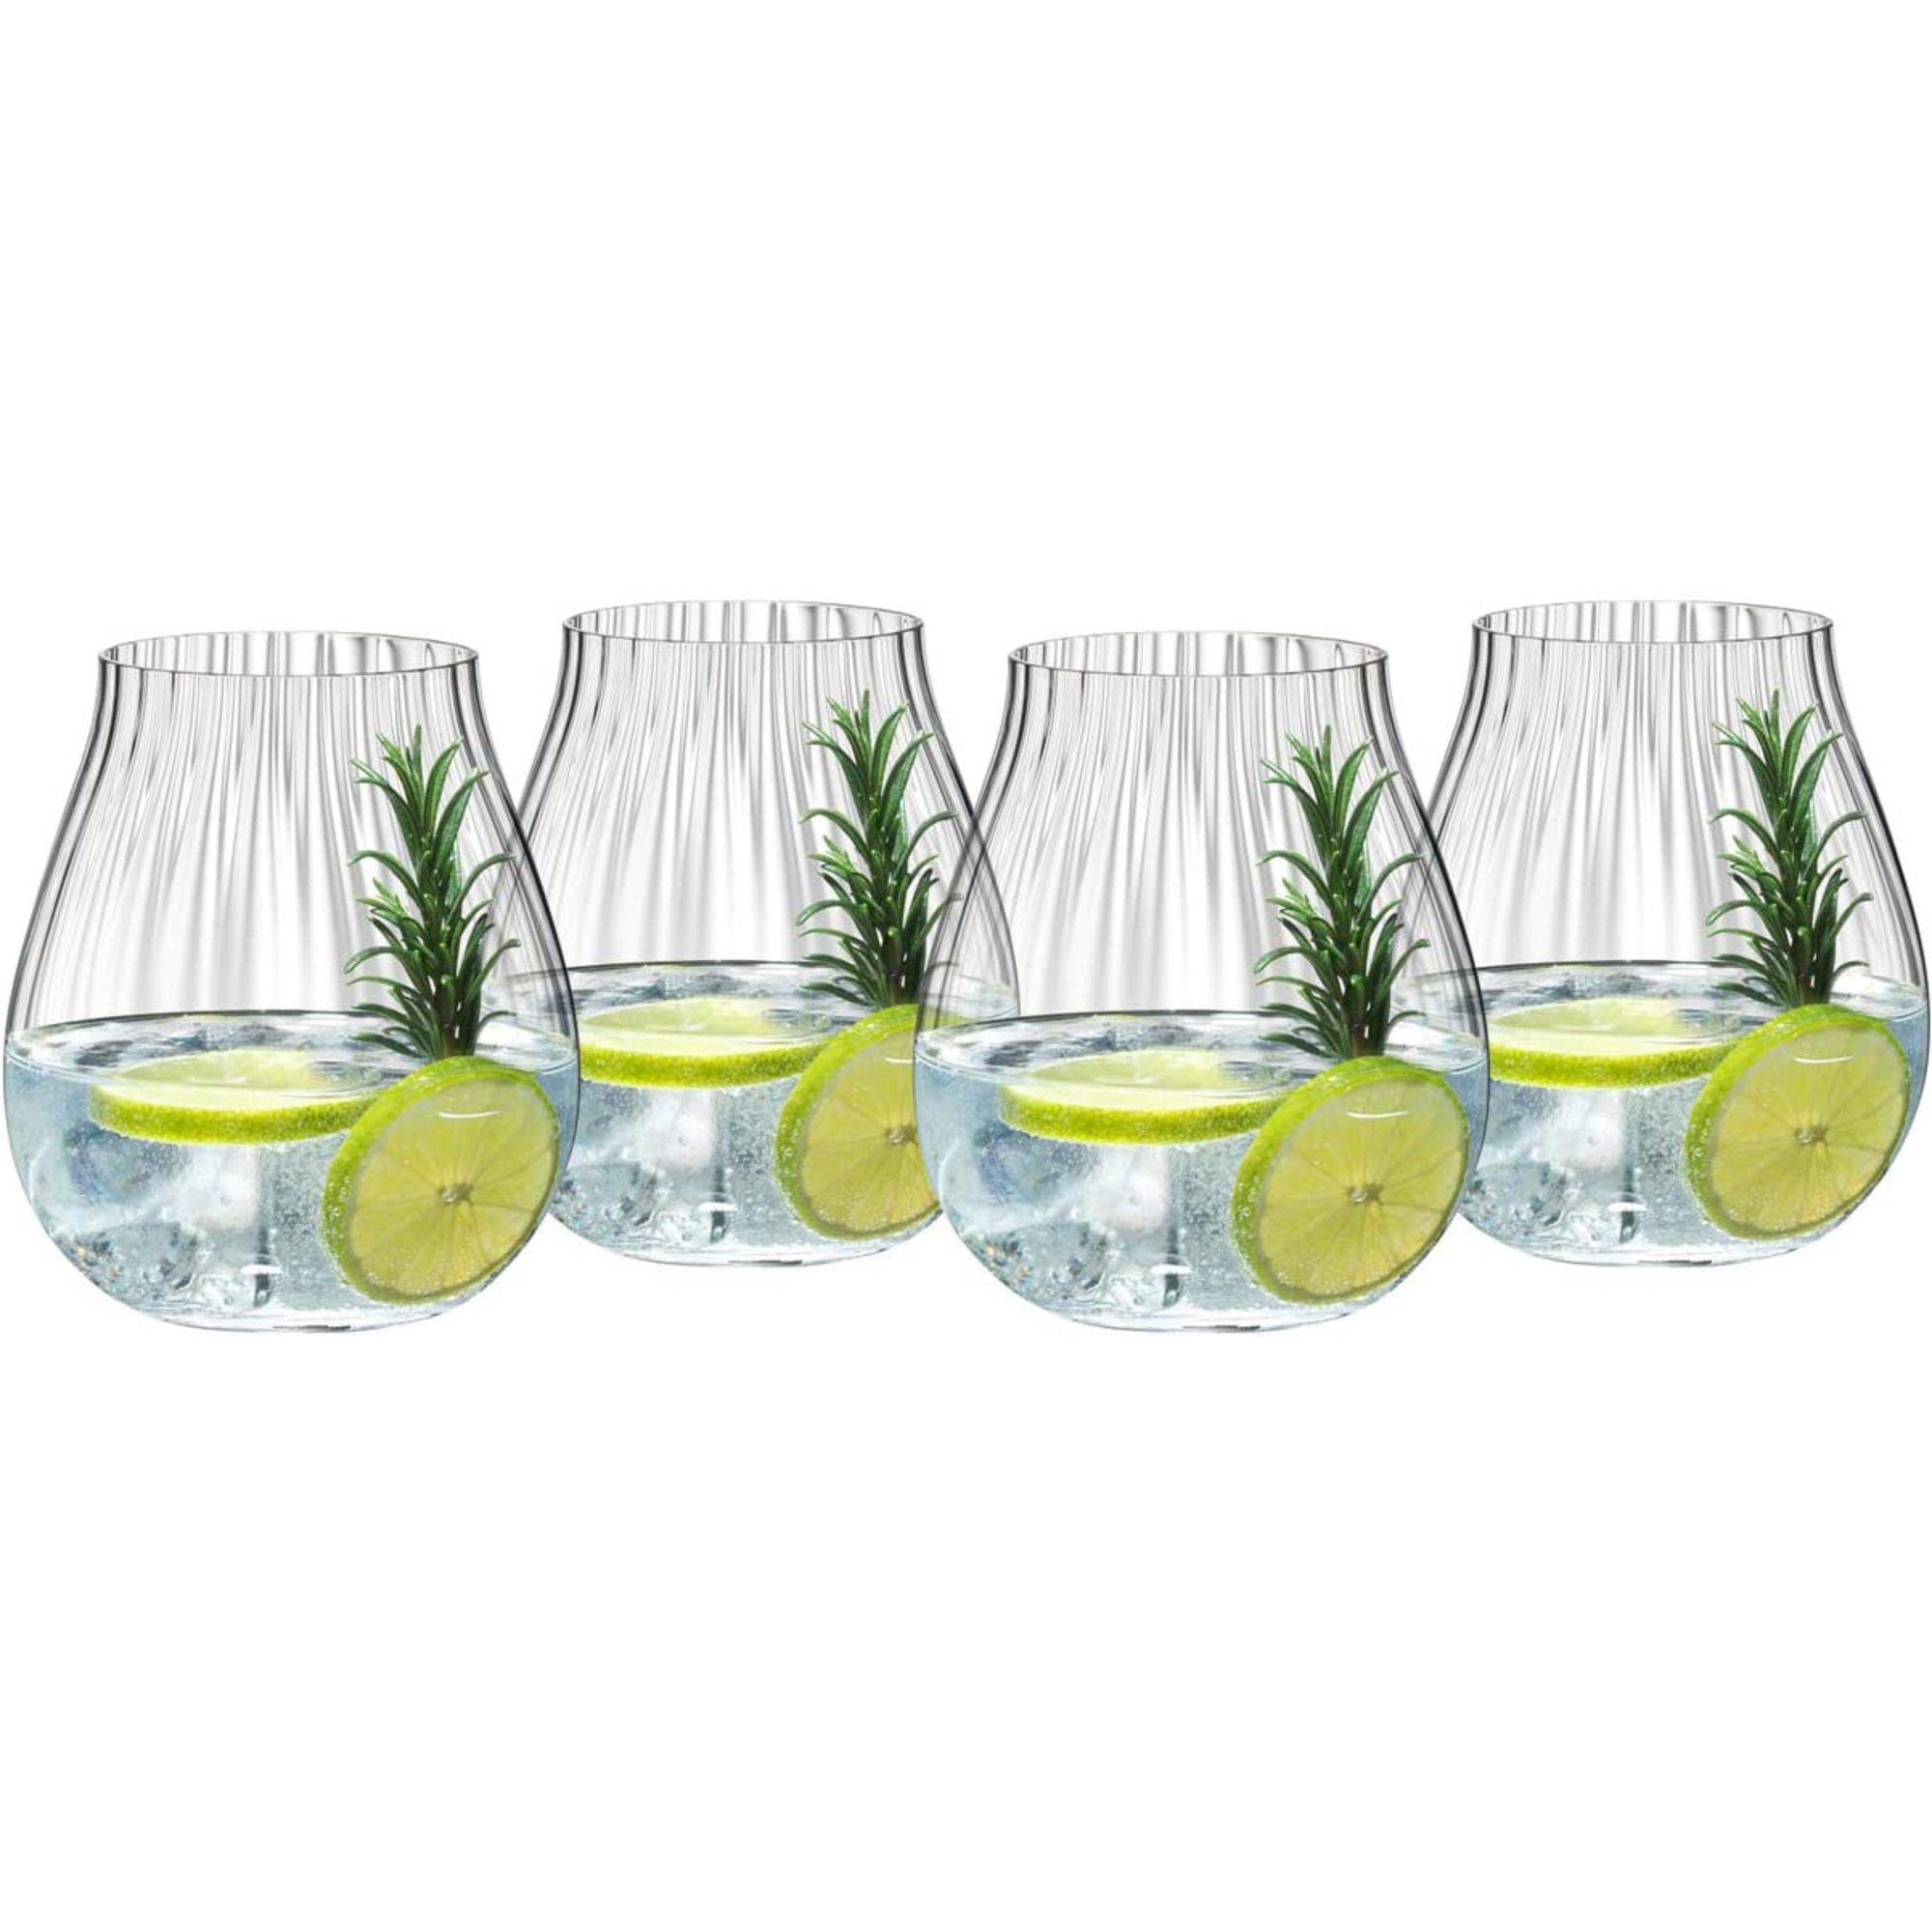 Riedel Optic Gin & Tonic-glas 4 st